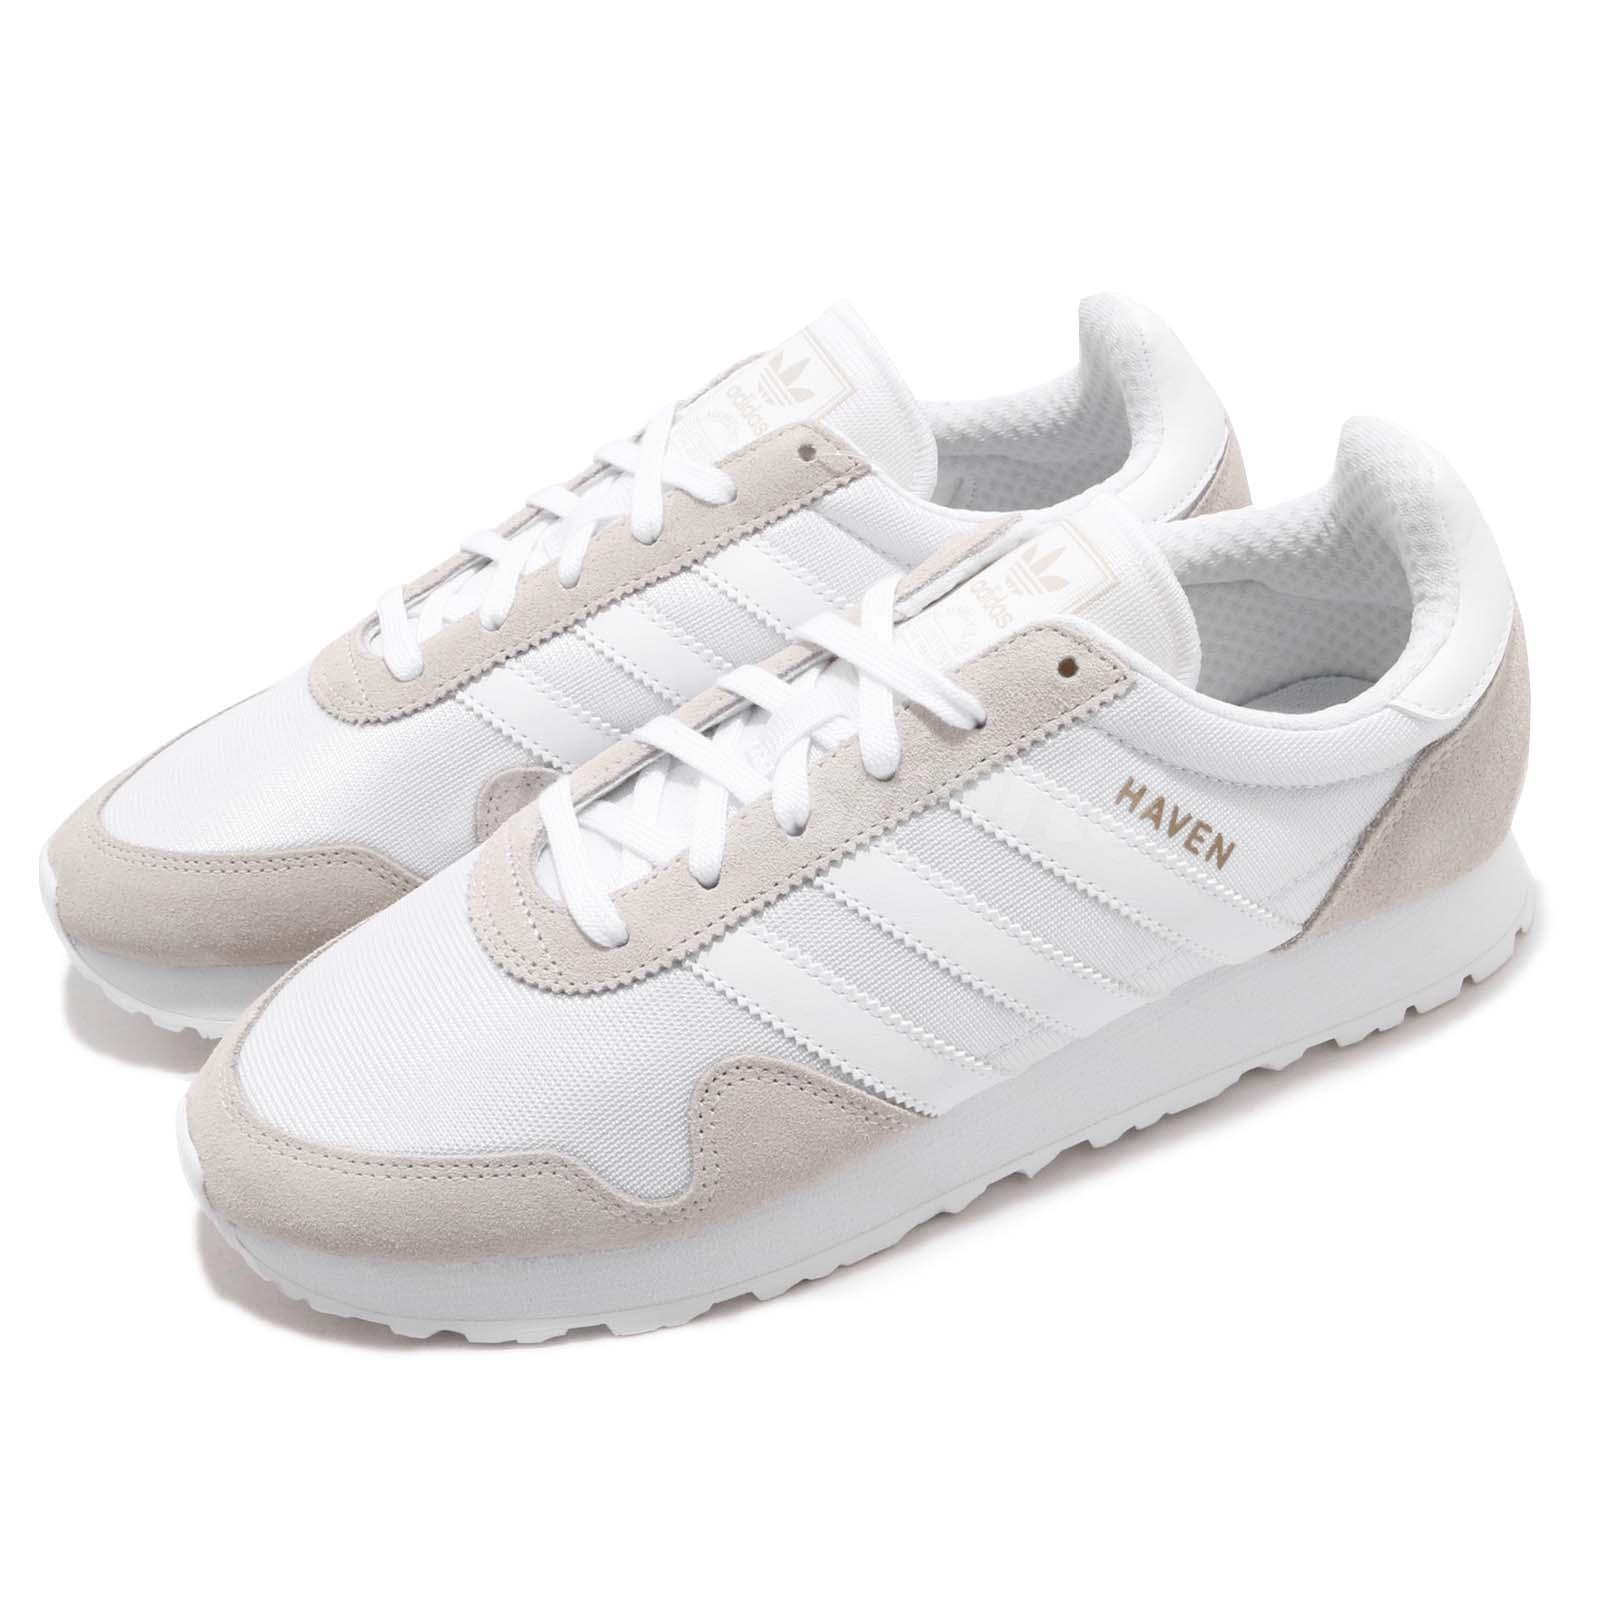 0fc64dbce81 adidas Originals Haven Vintage White Grey Men Running Shoes Sneakers ...